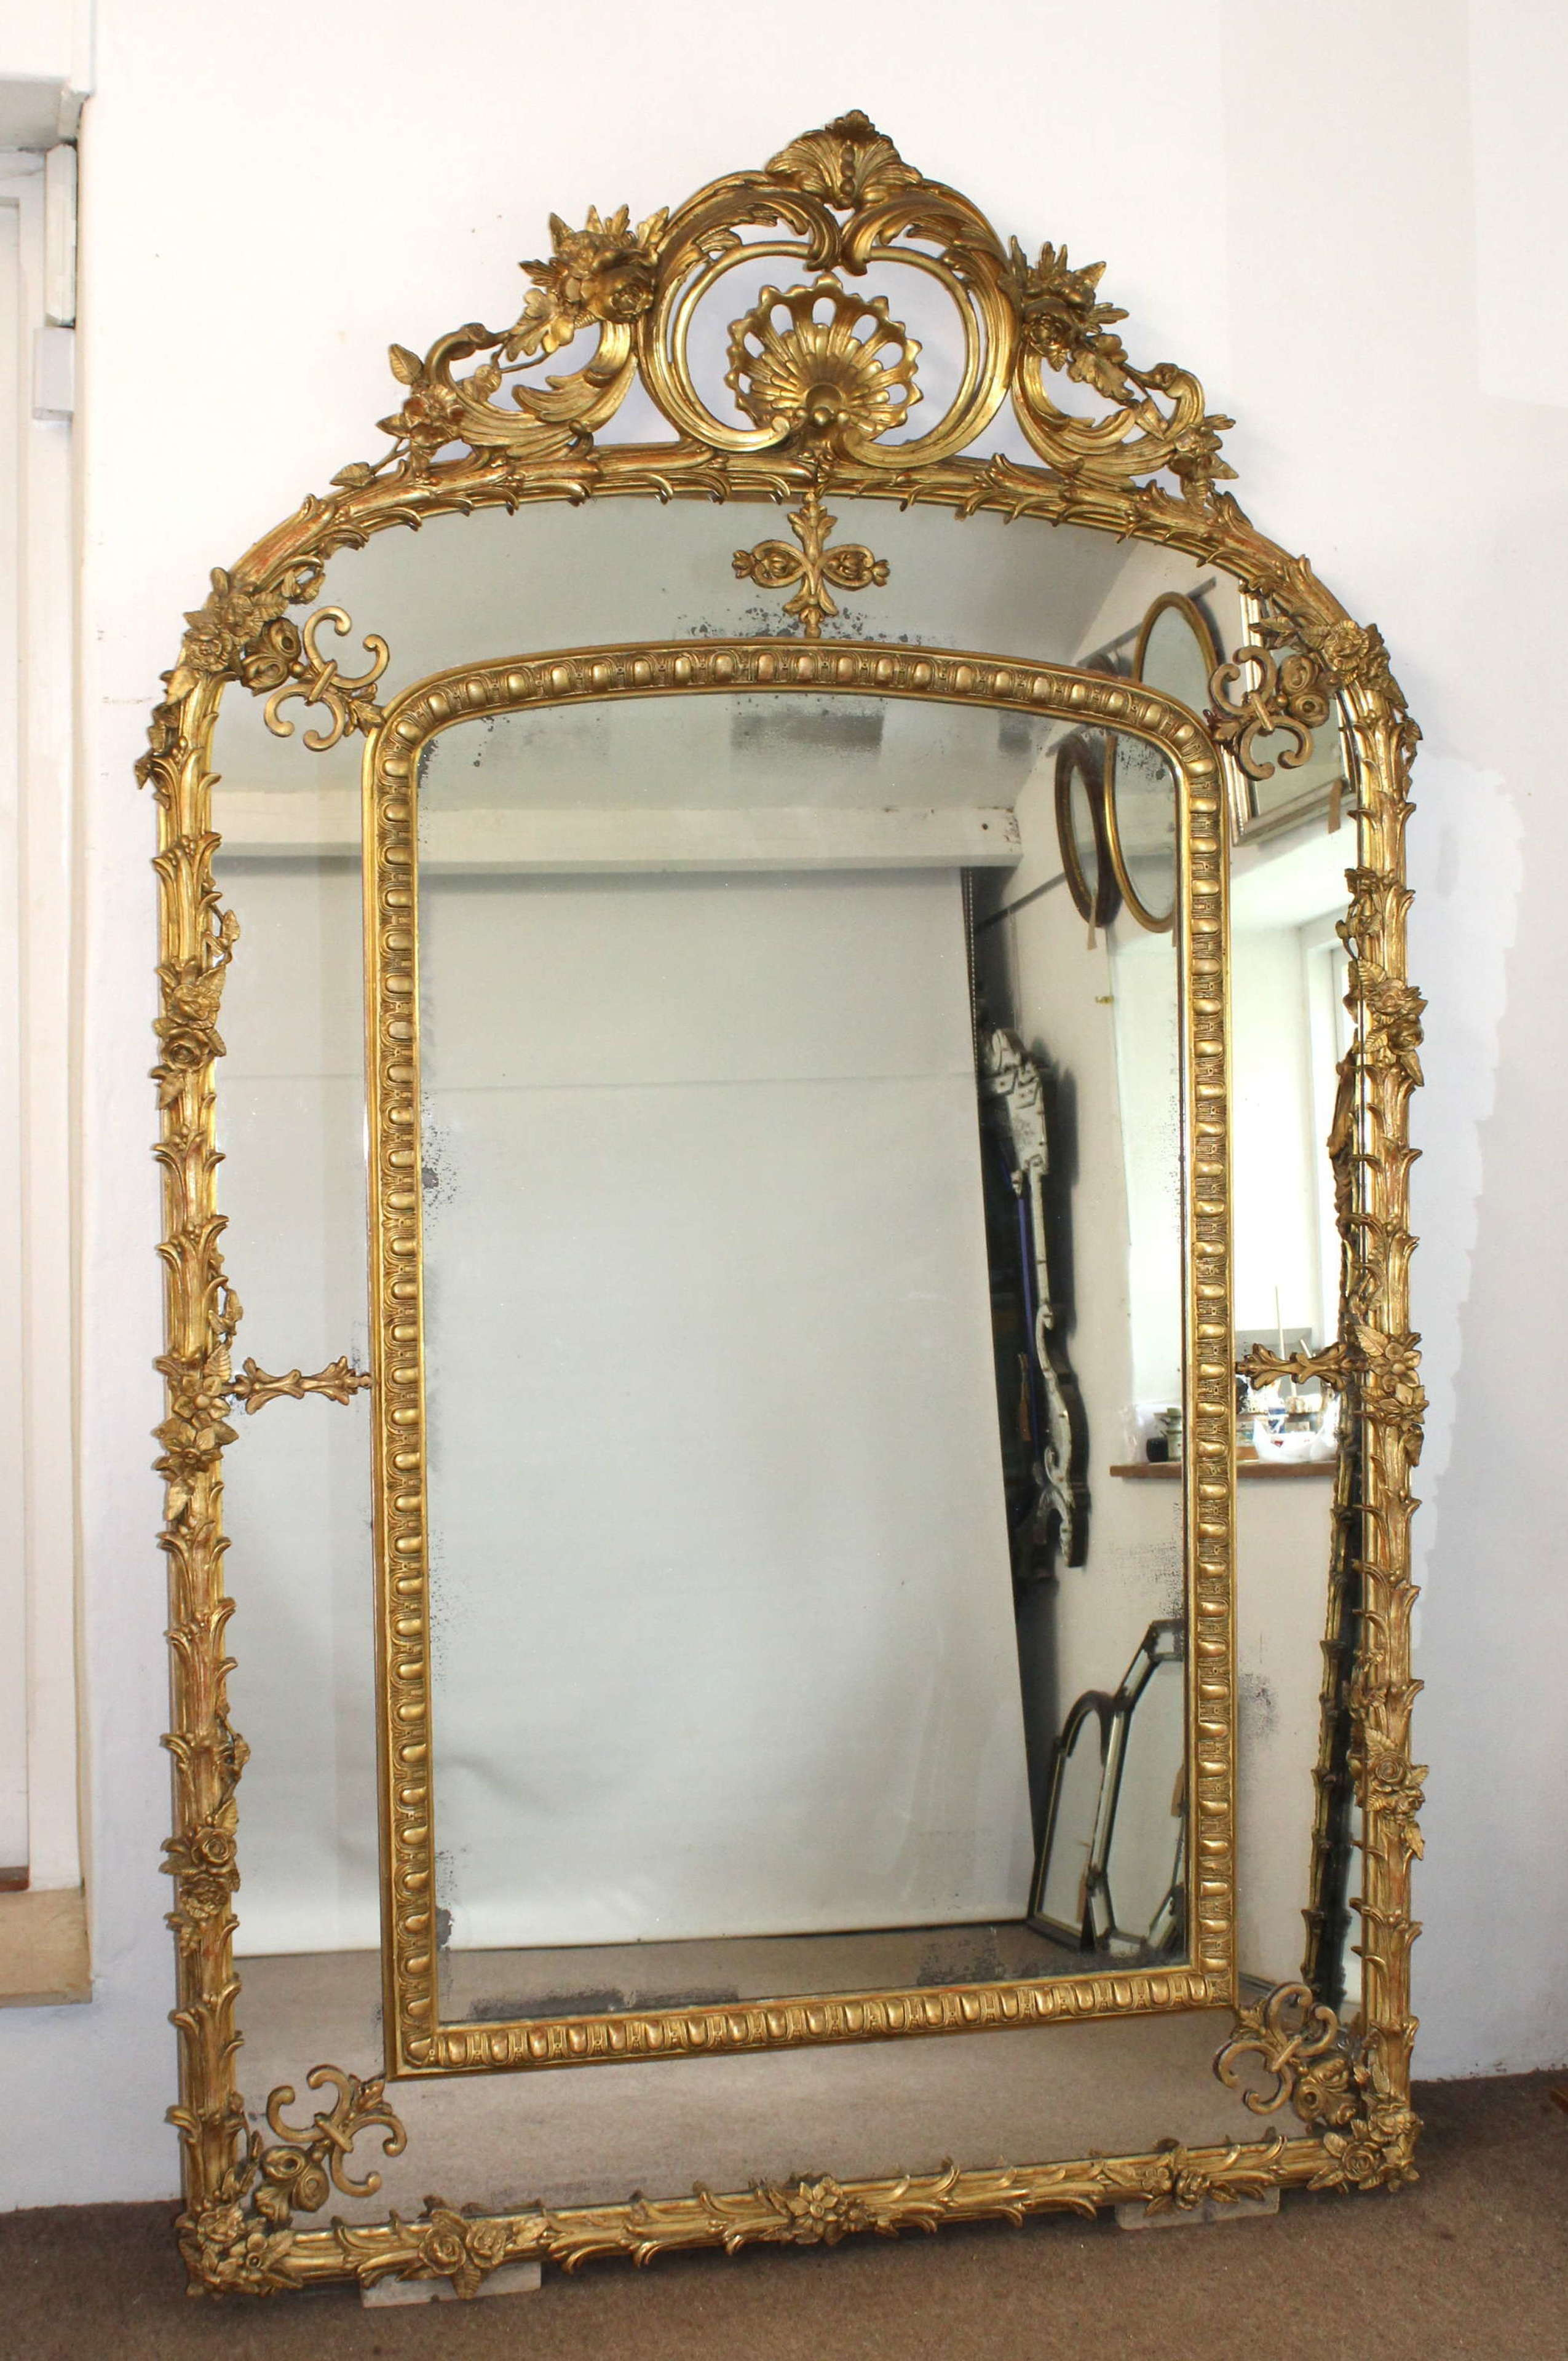 Huge, decorative, antique French margin mirror